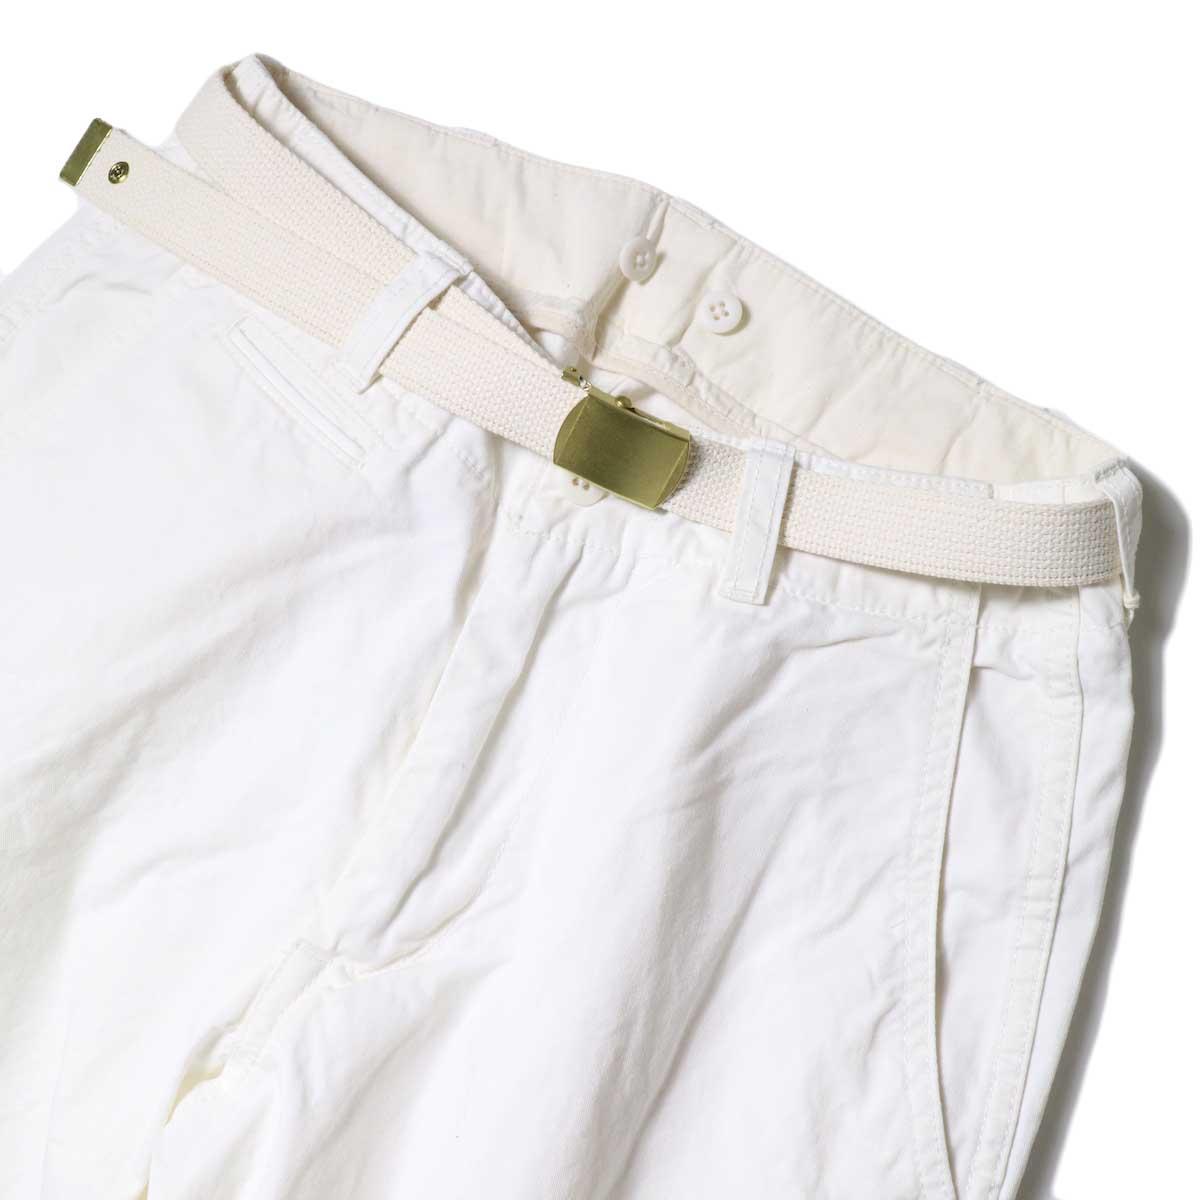 Master&Co. / CUT OFF PANTS (White) フロントアップ①